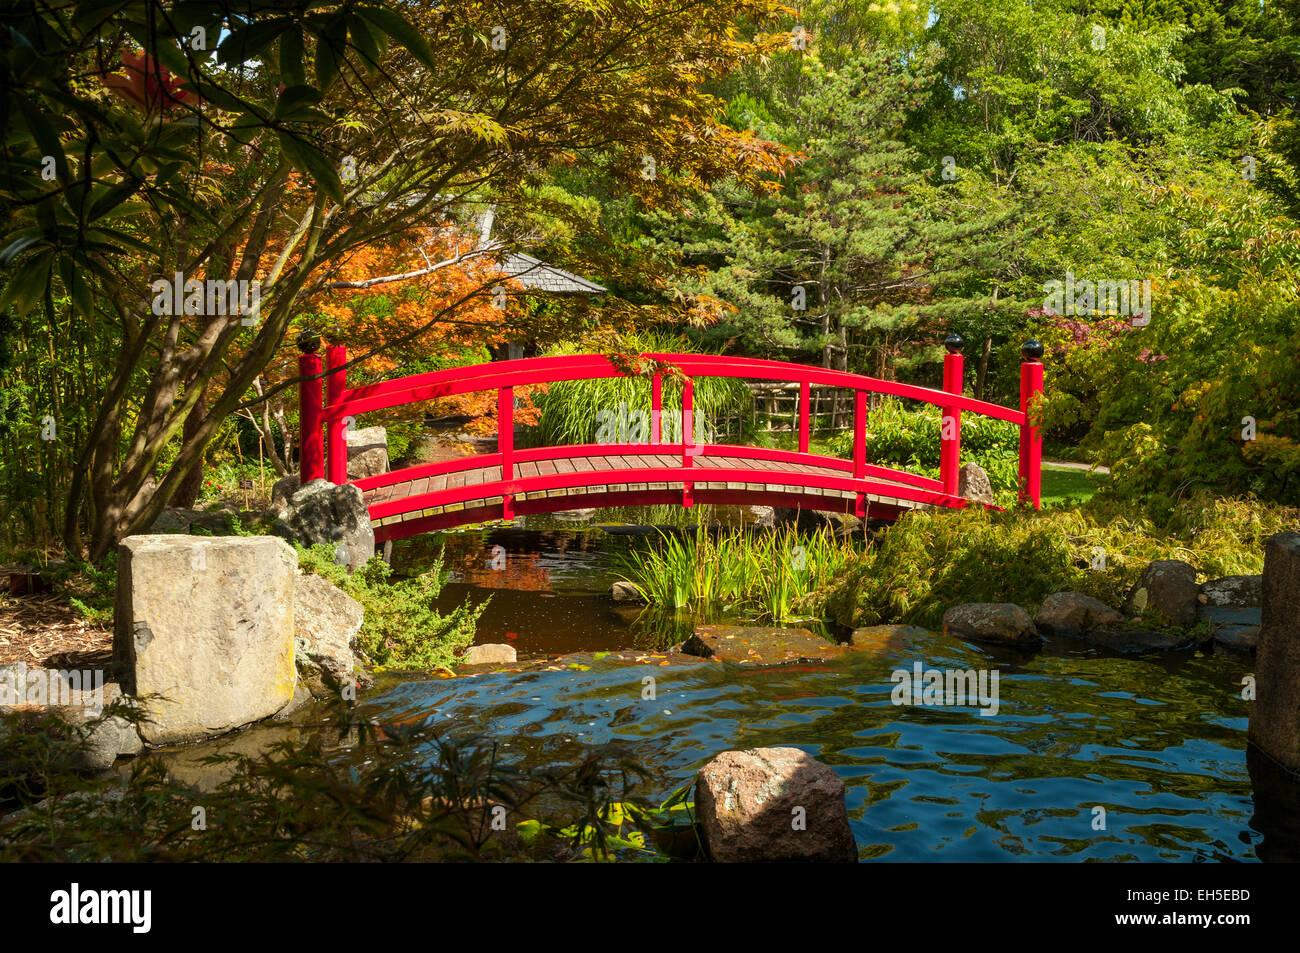 Japanese Gardens Australia Stock Photos & Japanese Gardens Australia ...